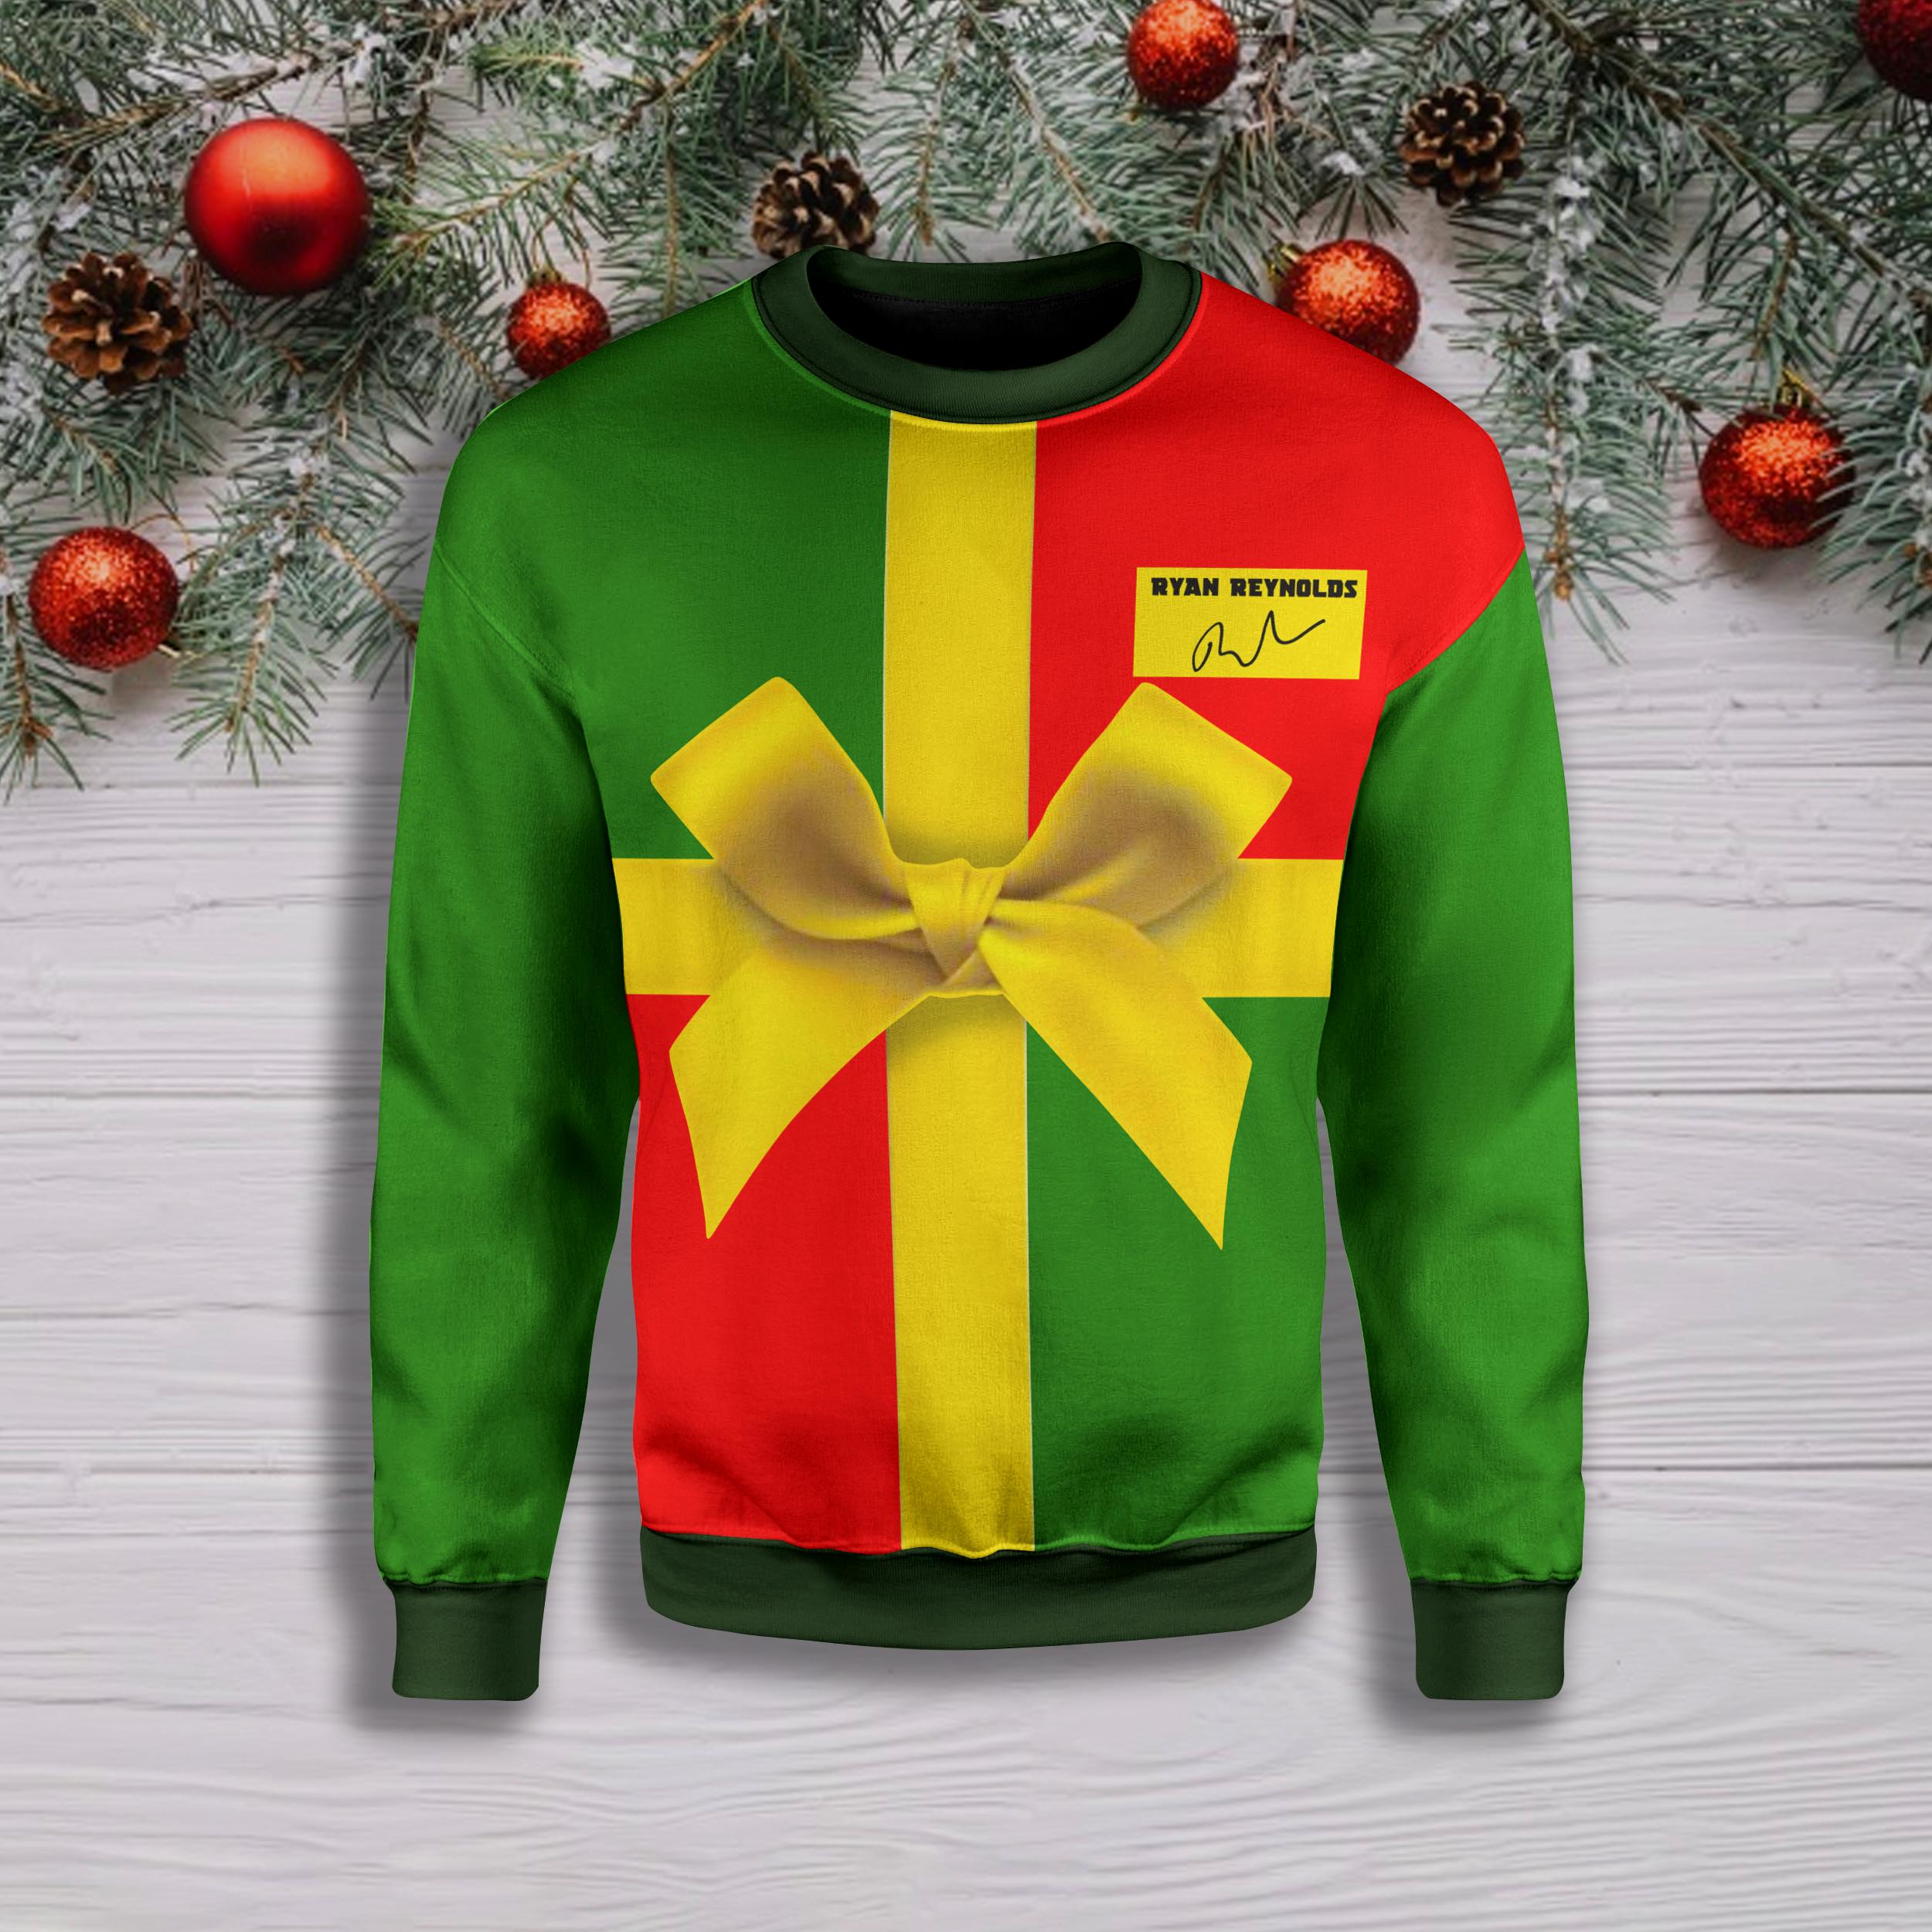 Ryan reynold full printing ugly christmas sweater 4